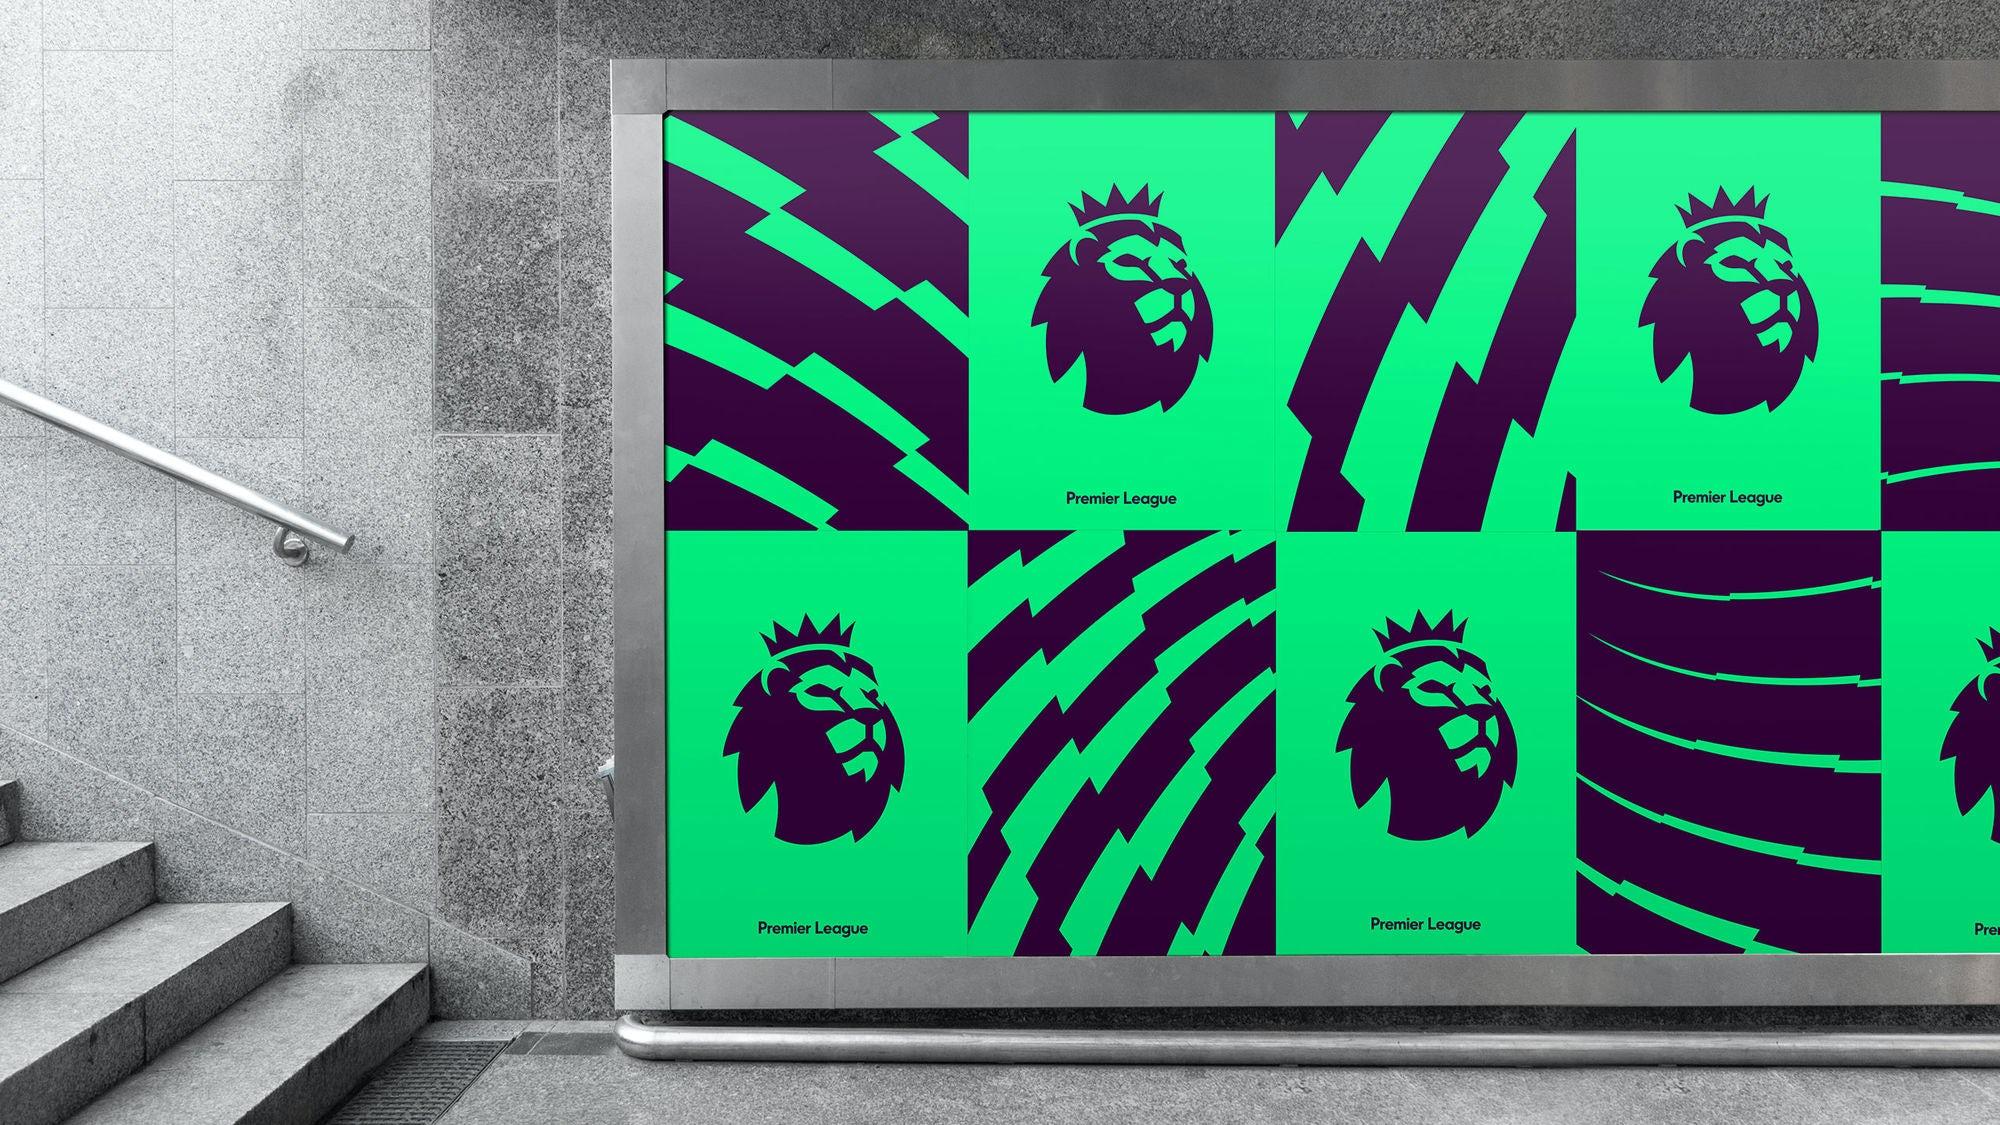 DesignStudio_Premier_League_Rebrand_2016_05-2000x1125